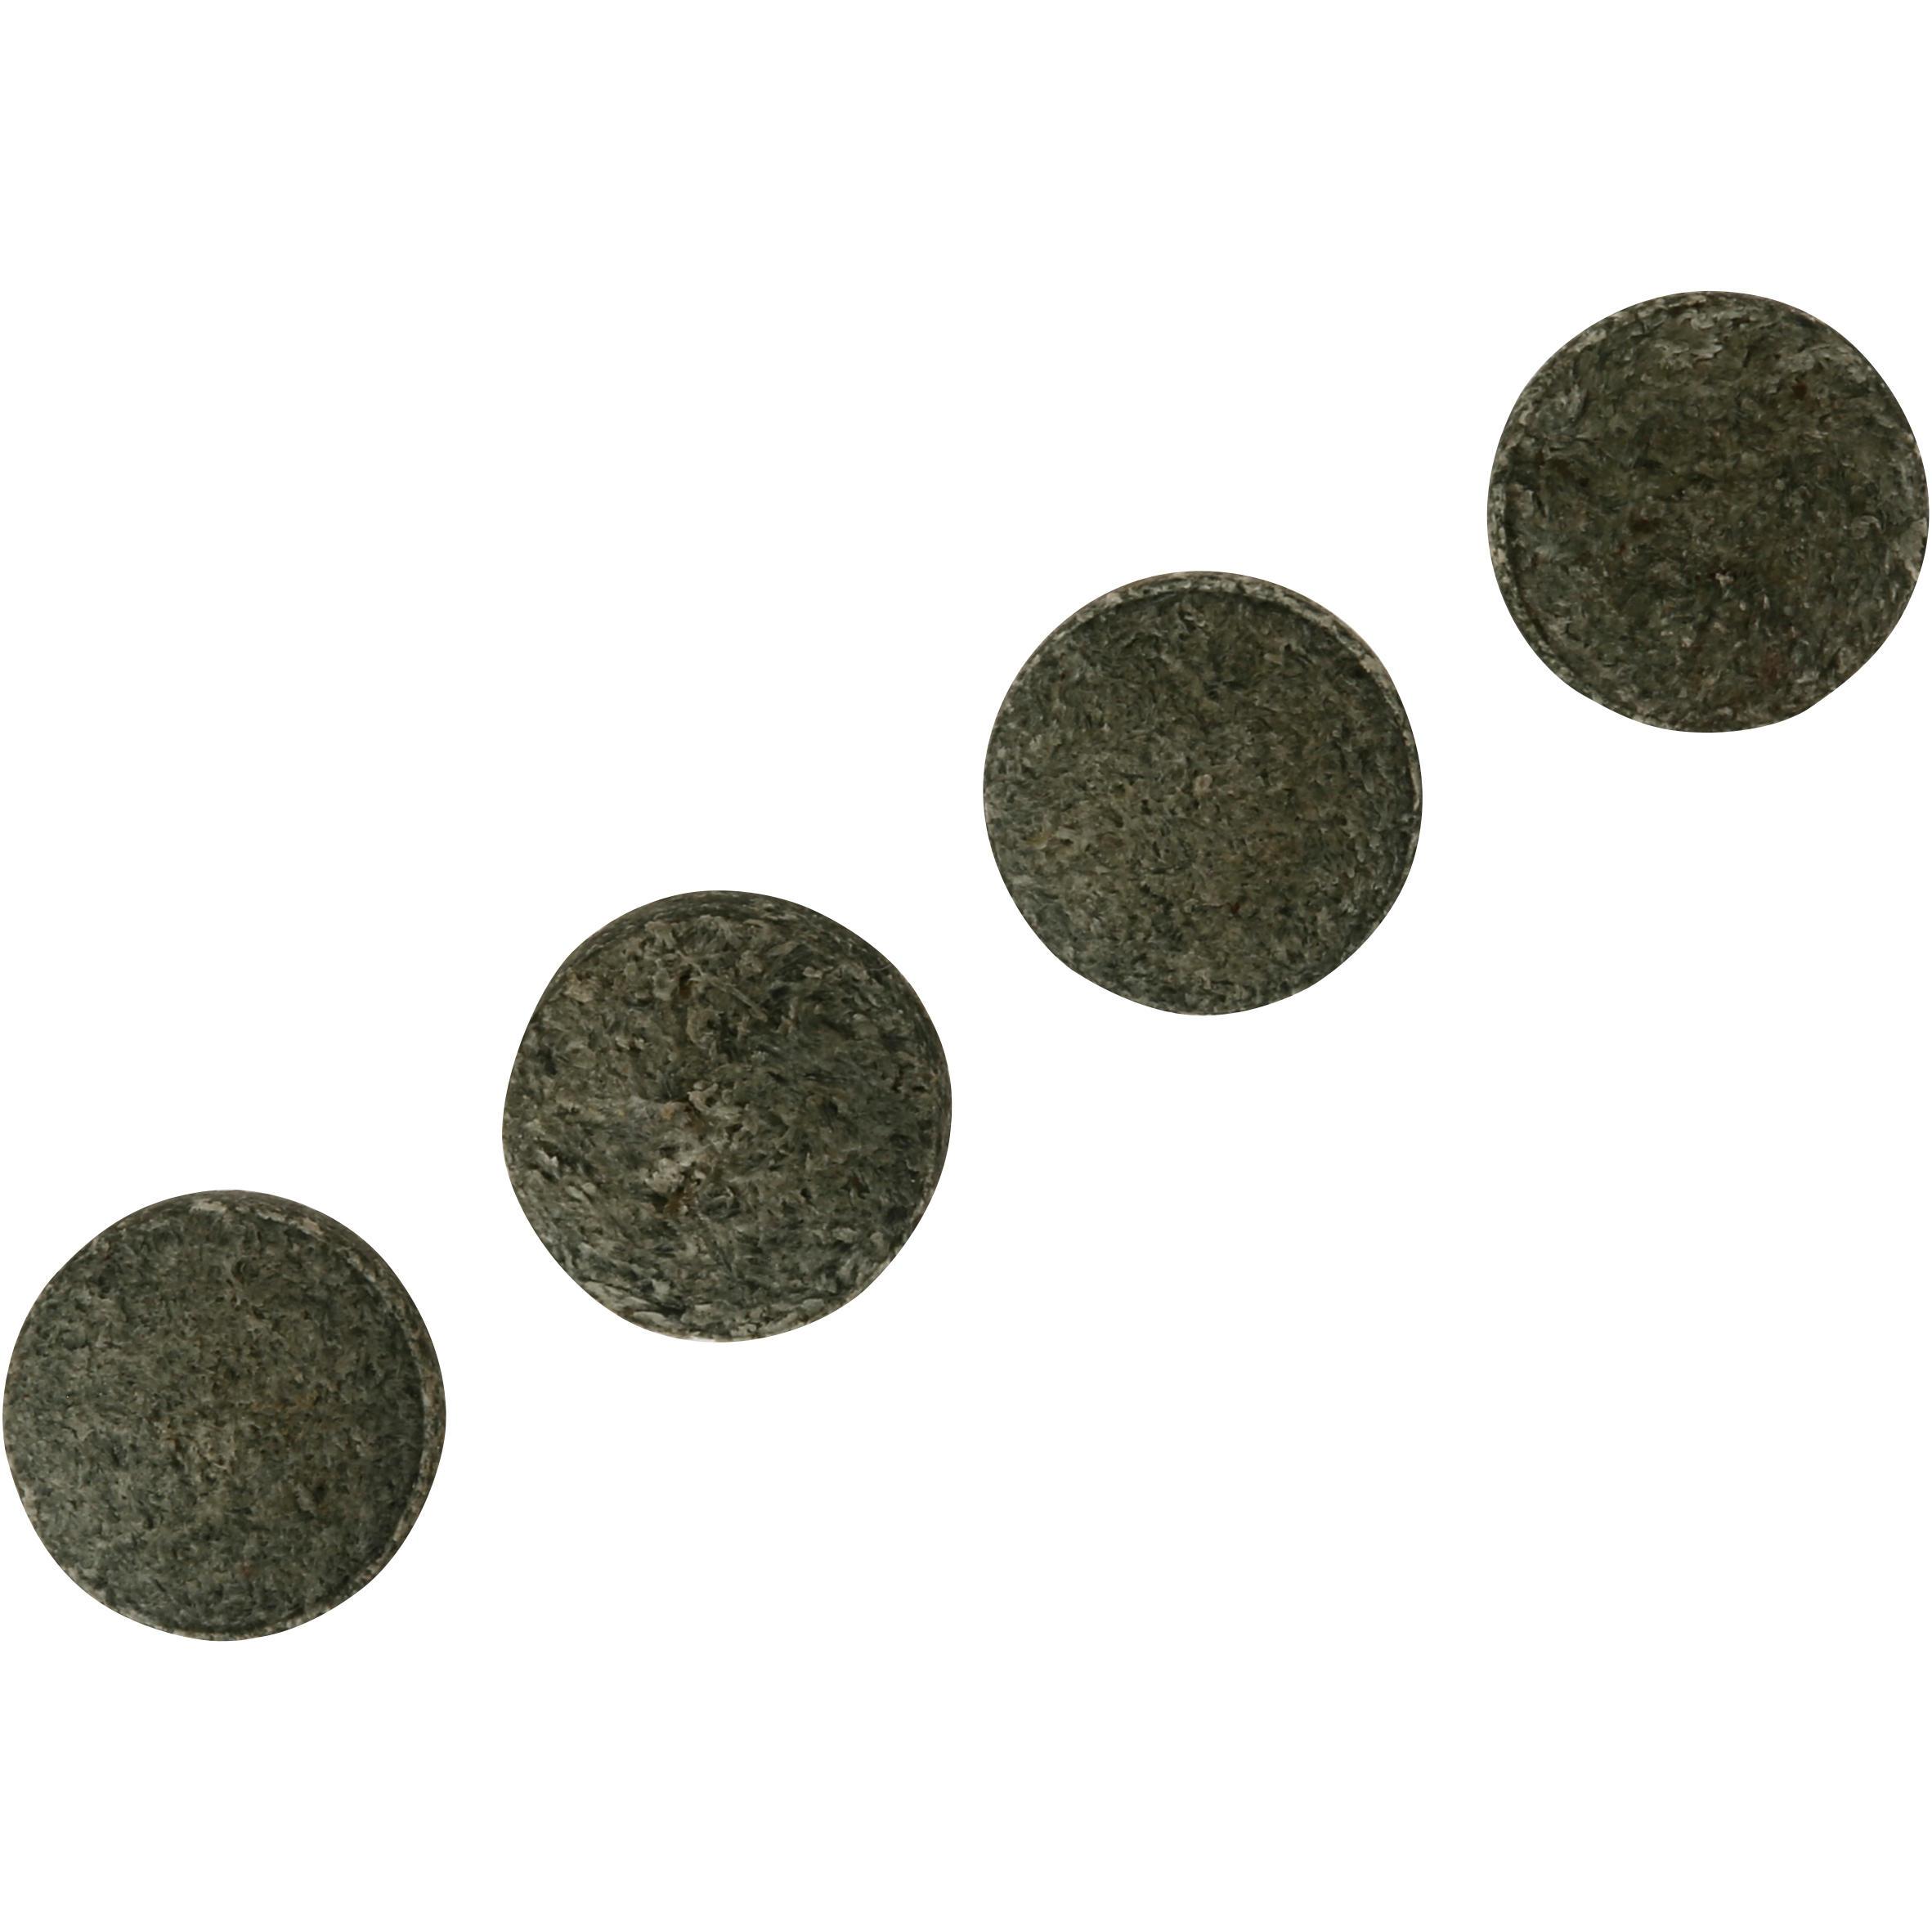 Pool Cue Tips 10 mm - 4-Pack